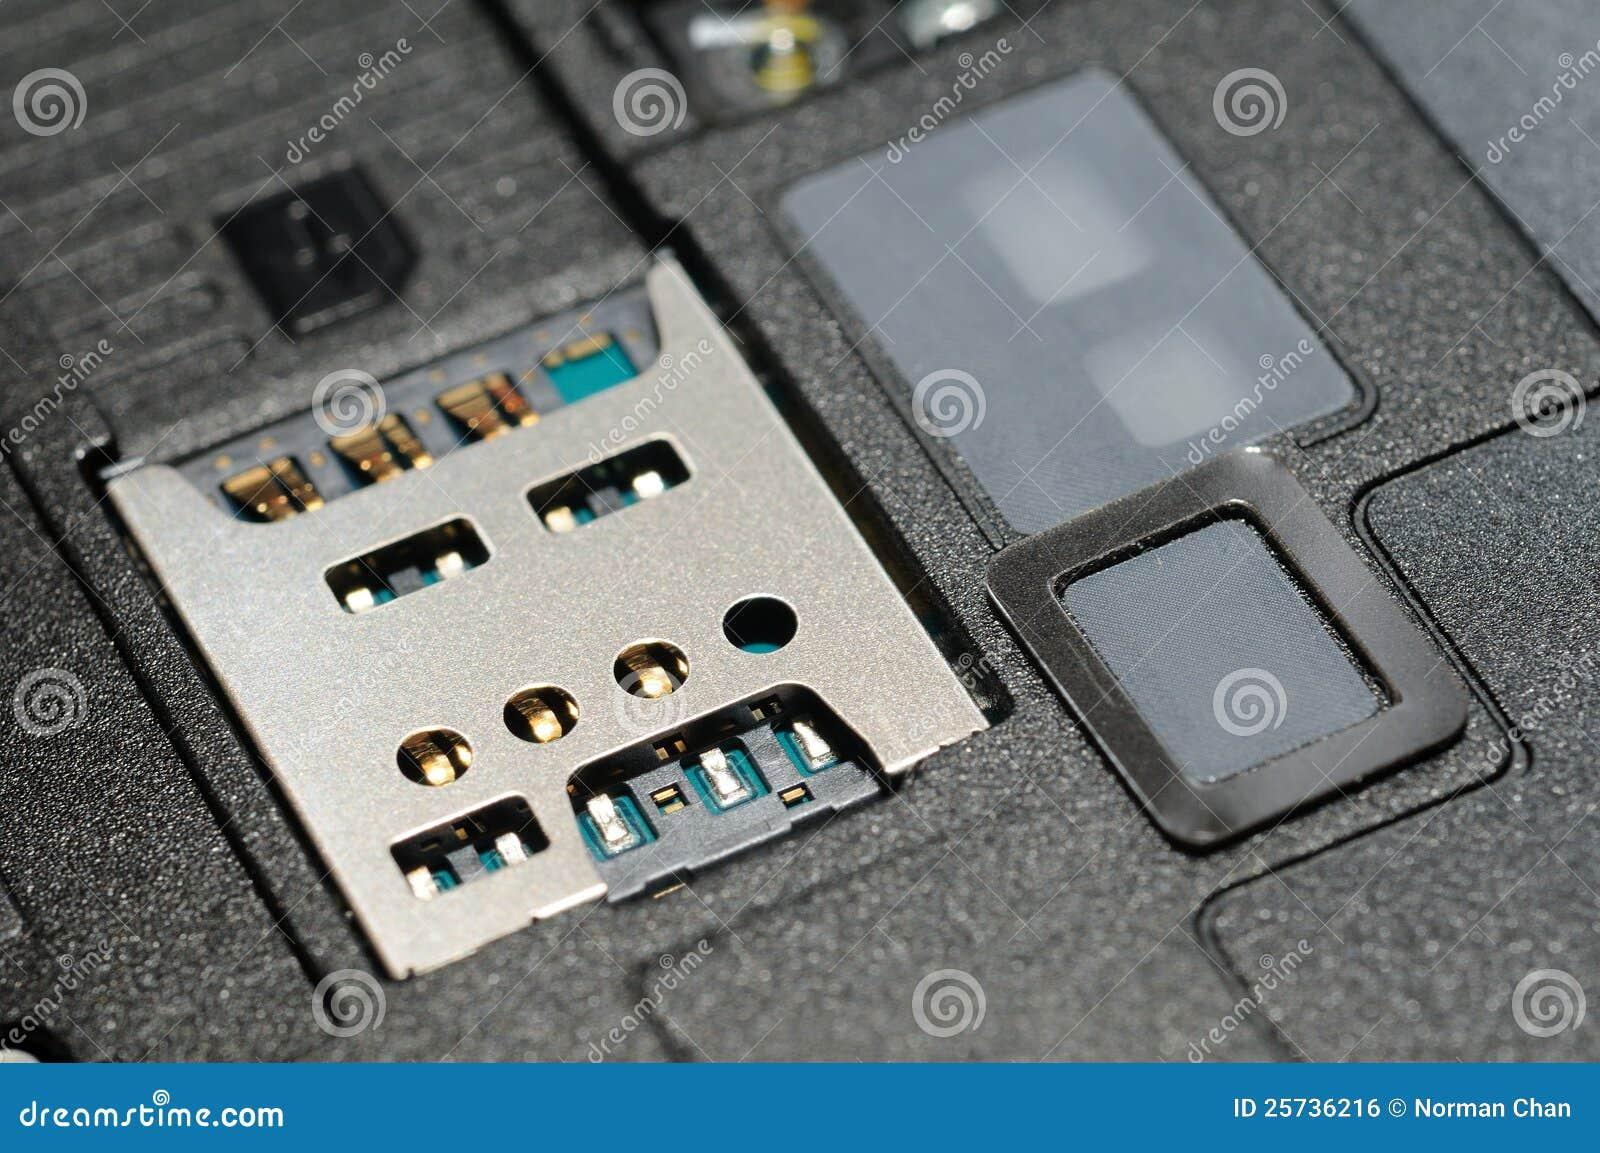 Micro sim card slot